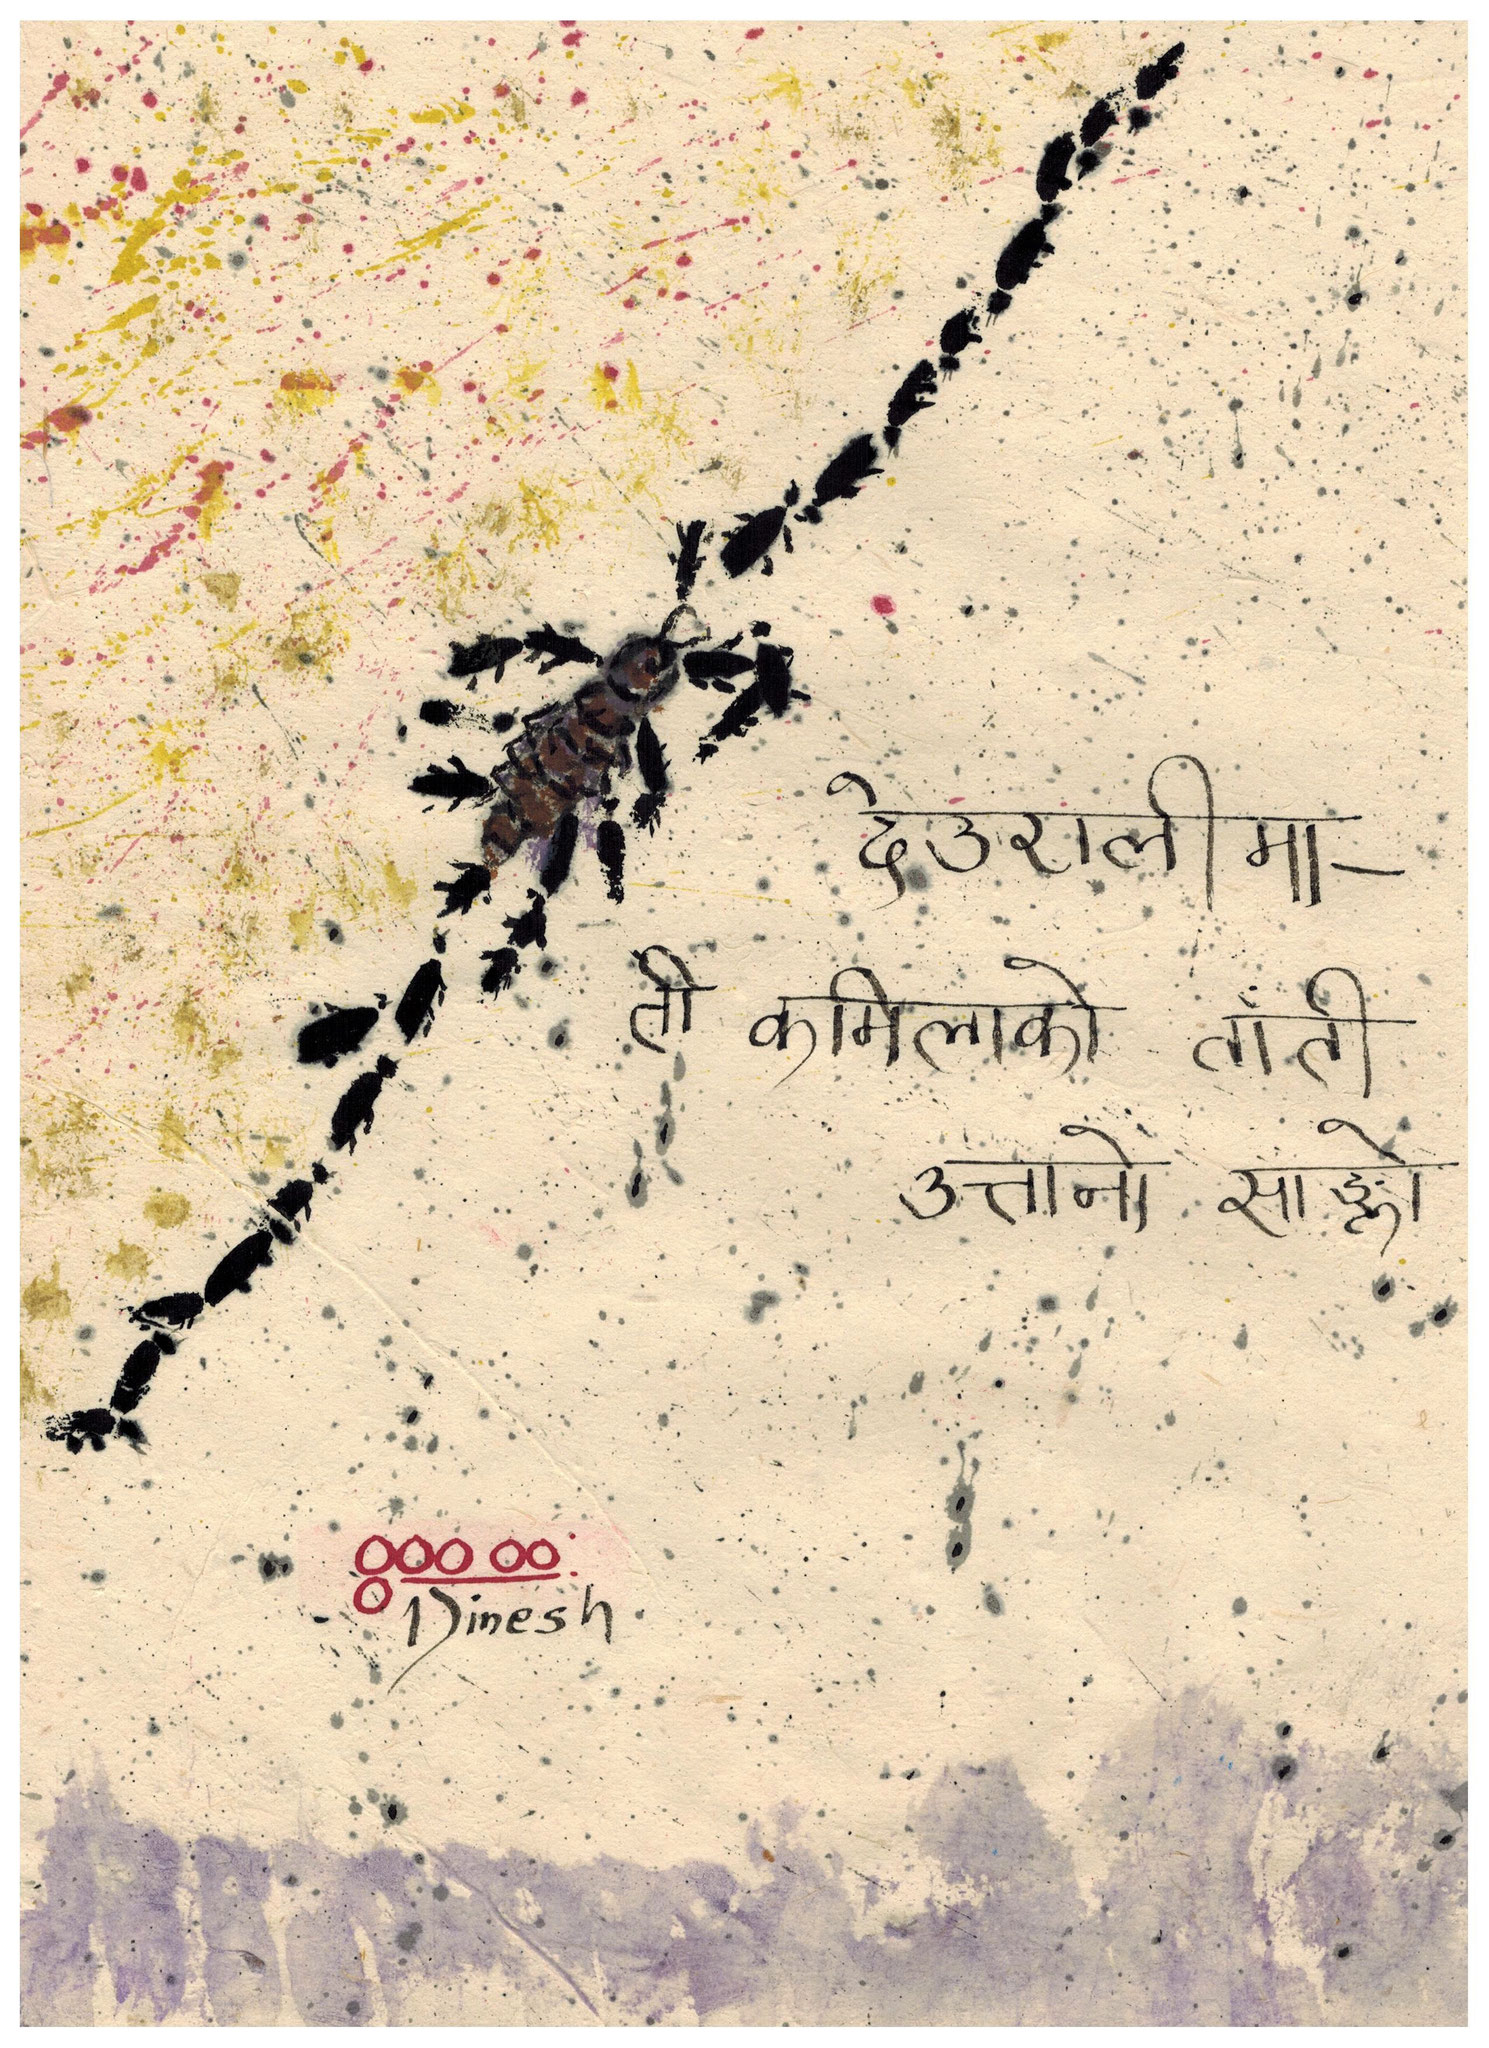 Haïsha de Godhooli Dinesh